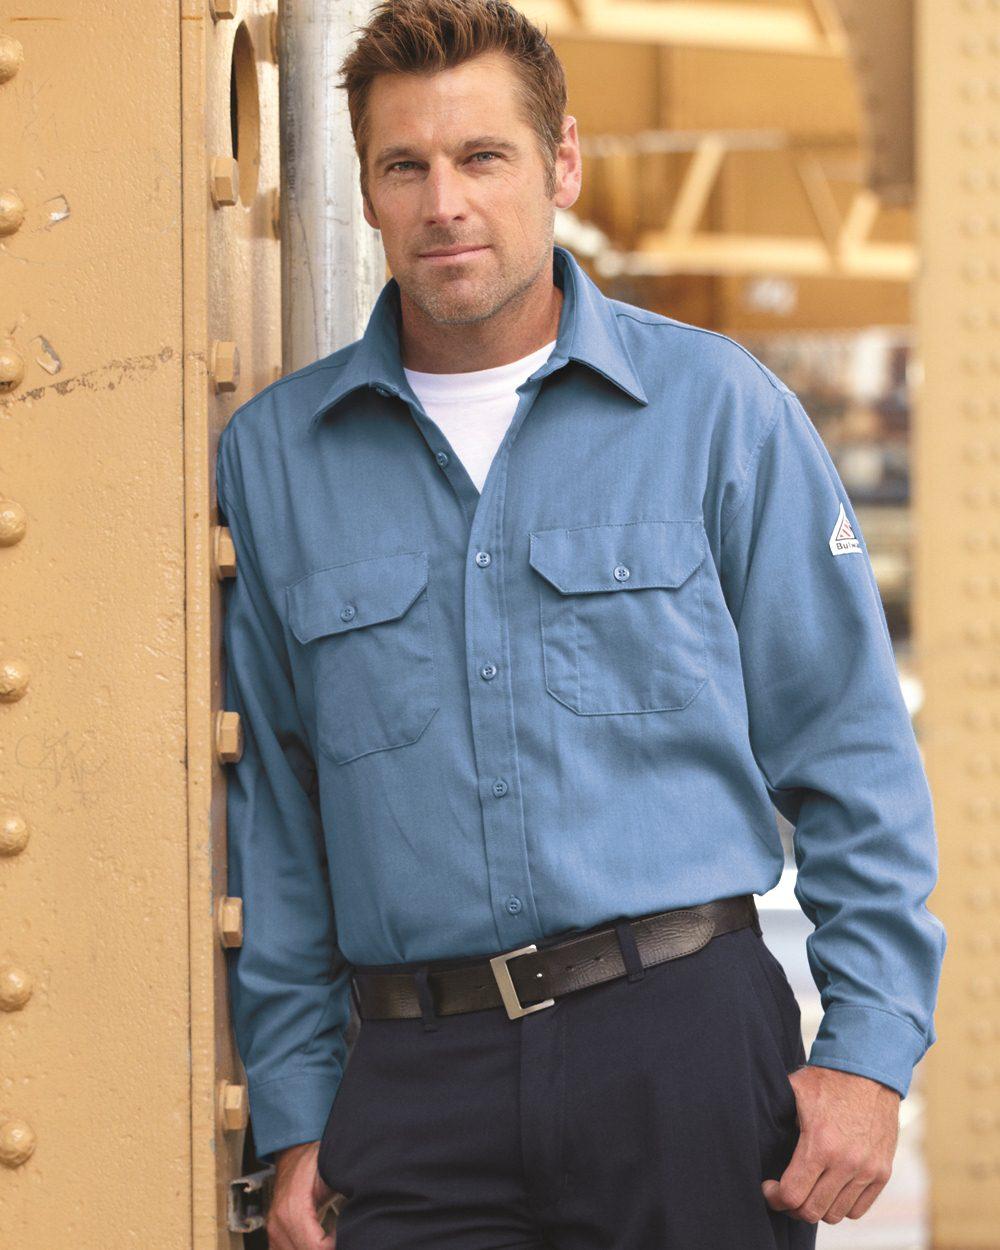 Bulwark - Dress Uniform Shirt